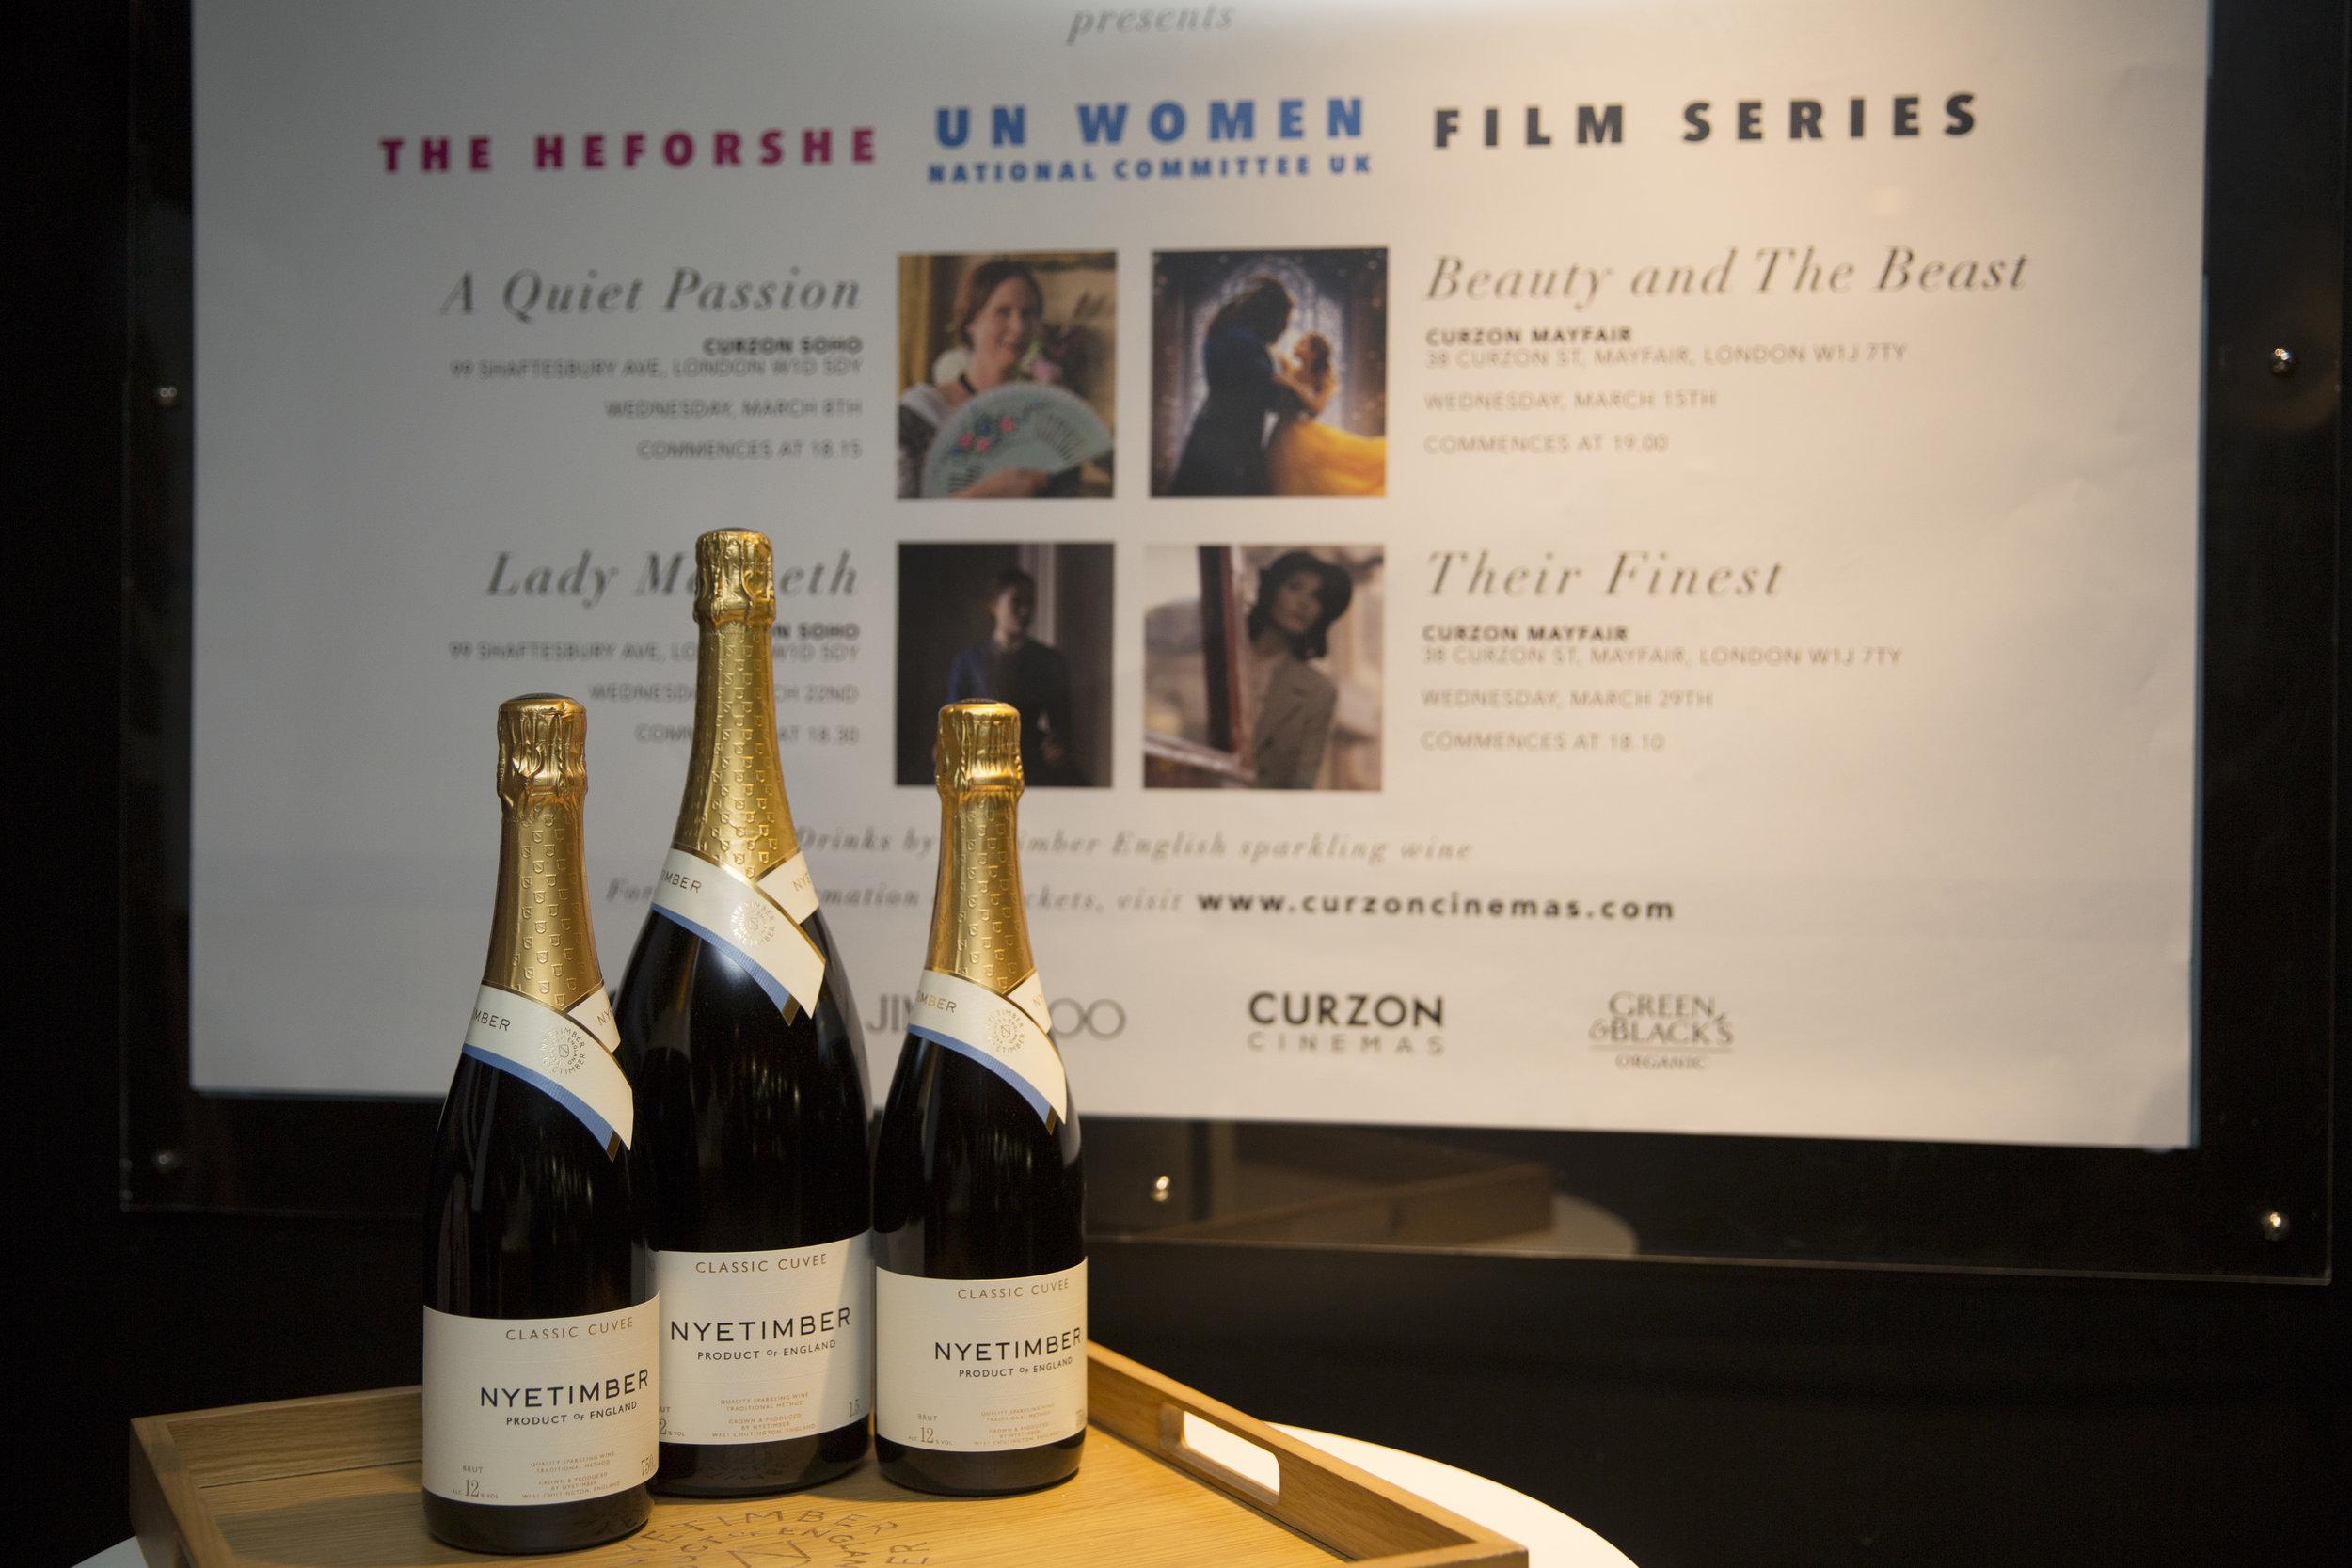 long-winded-lady-productions-un-women-24.jpg